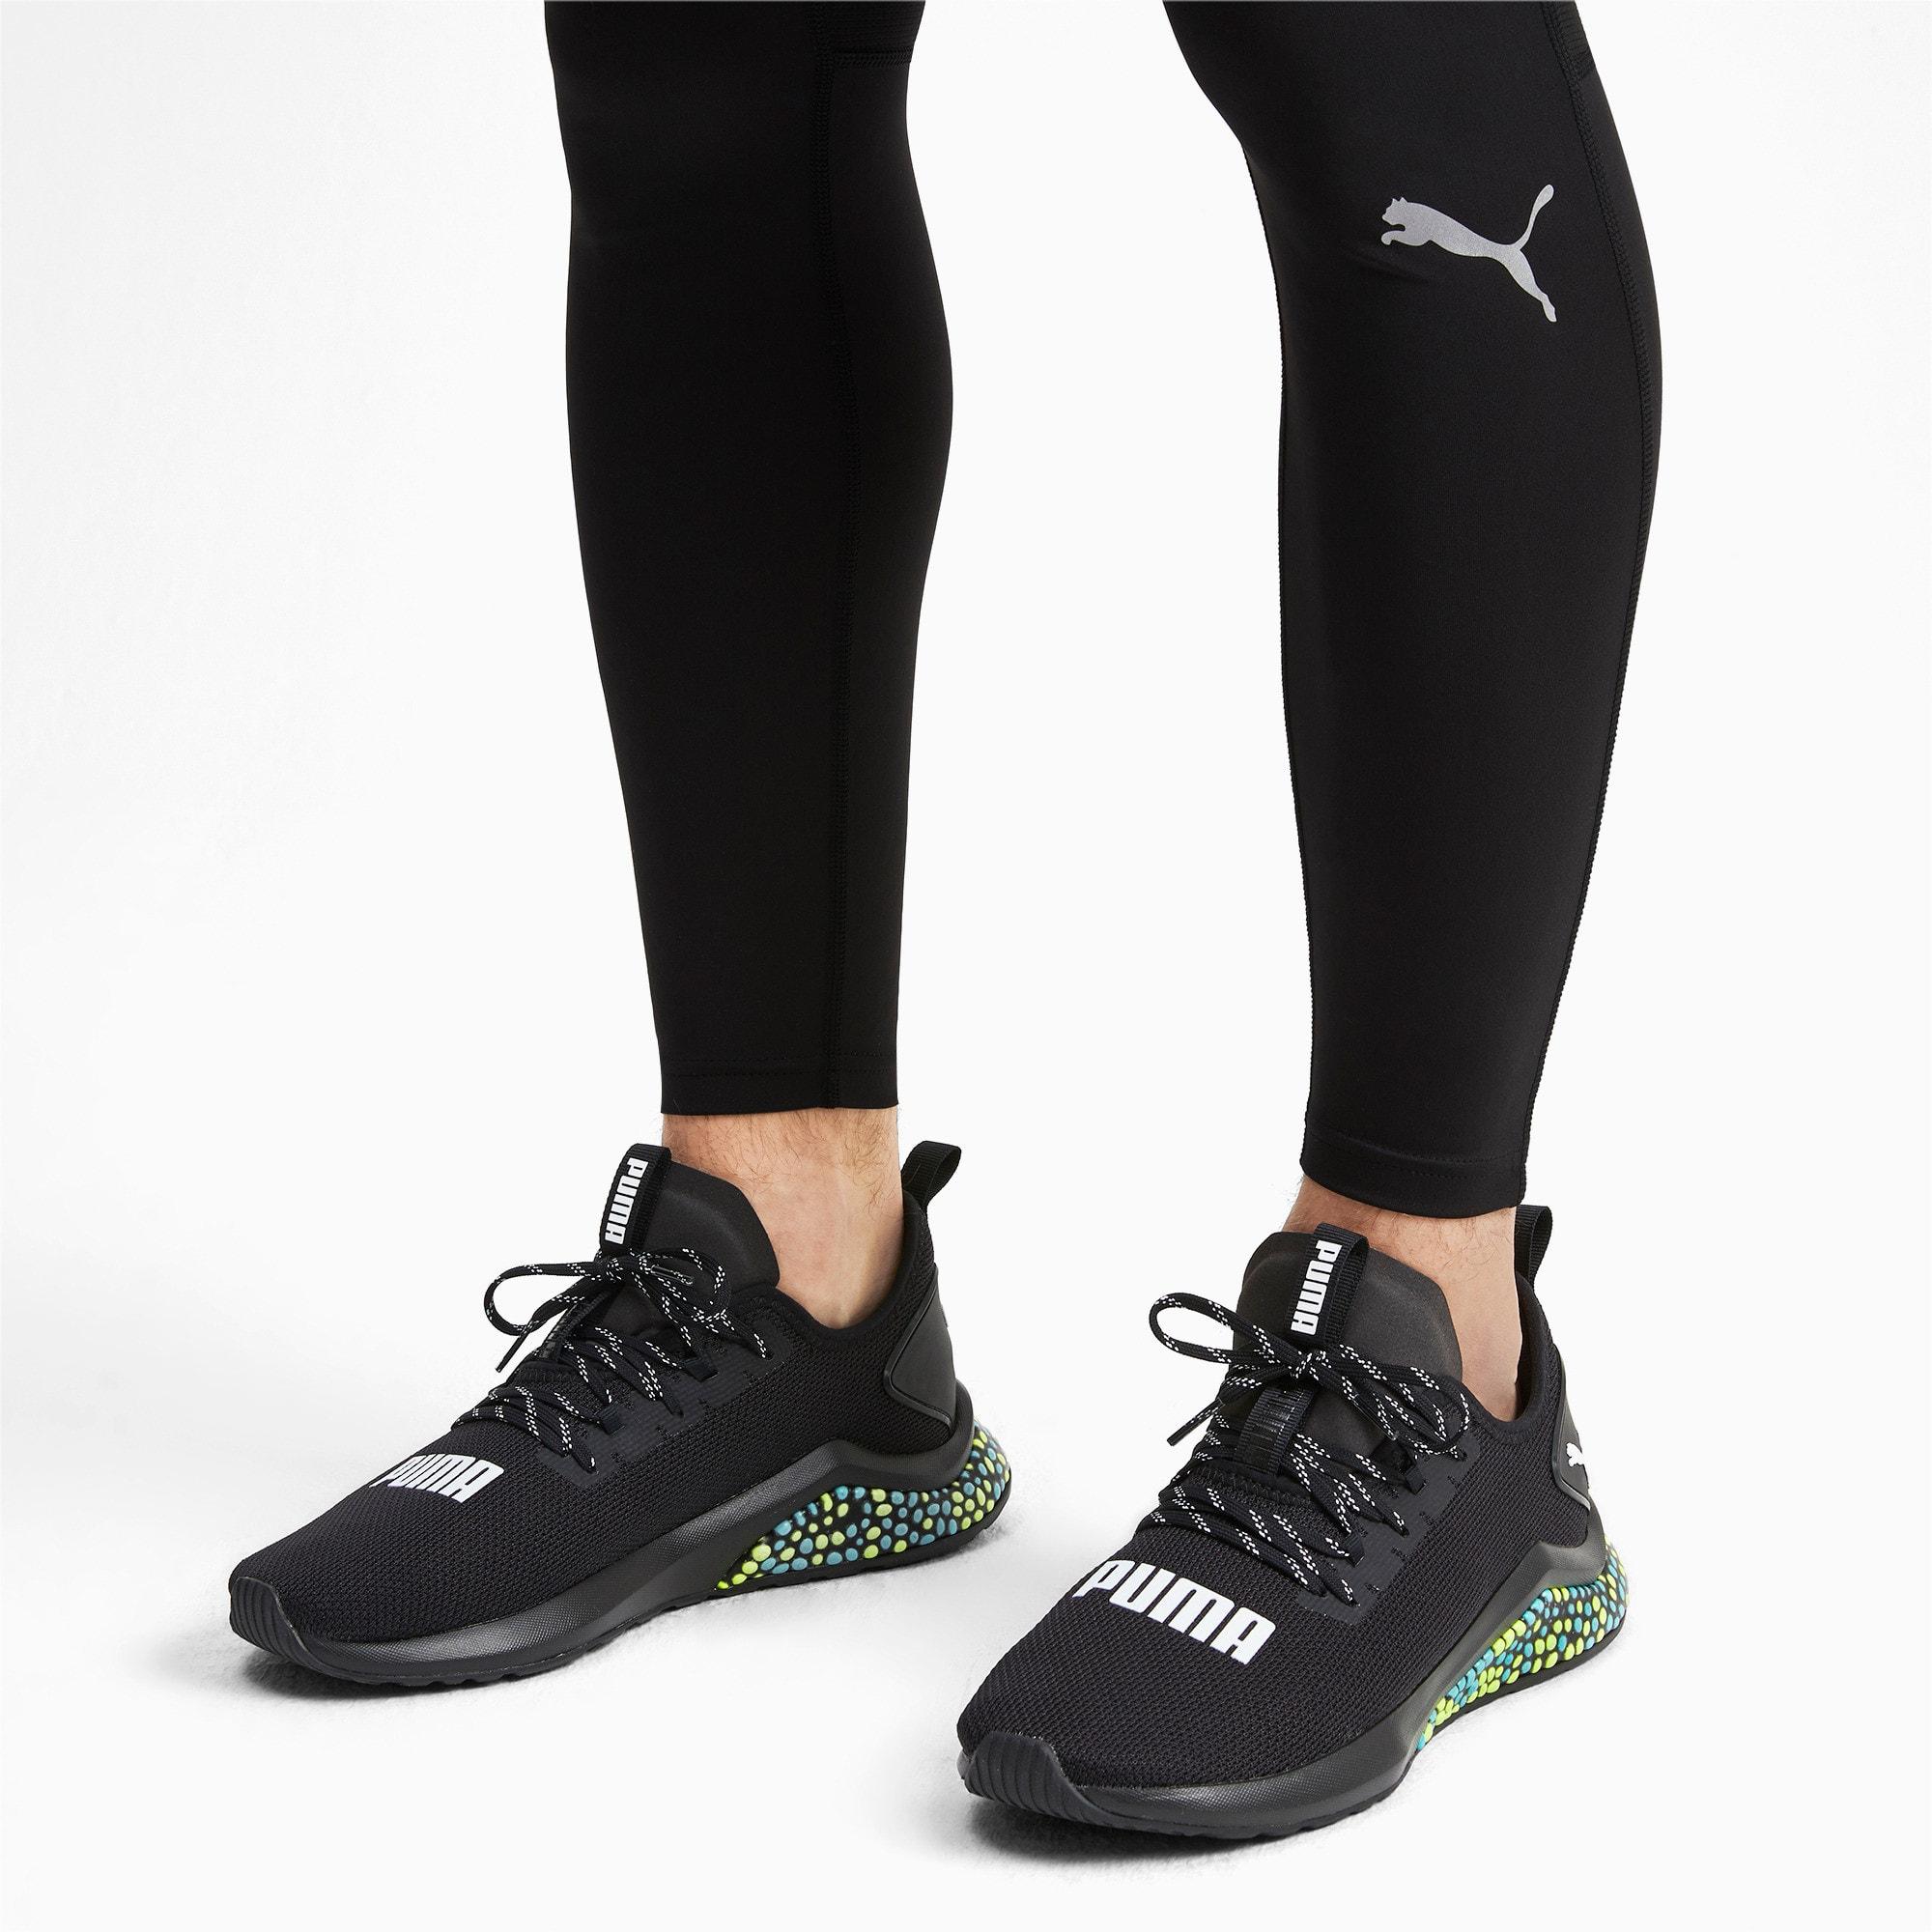 Thumbnail 2 of HYBRID NX Men's Running Shoes, Puma Black-Yellow Alert-Blue, medium